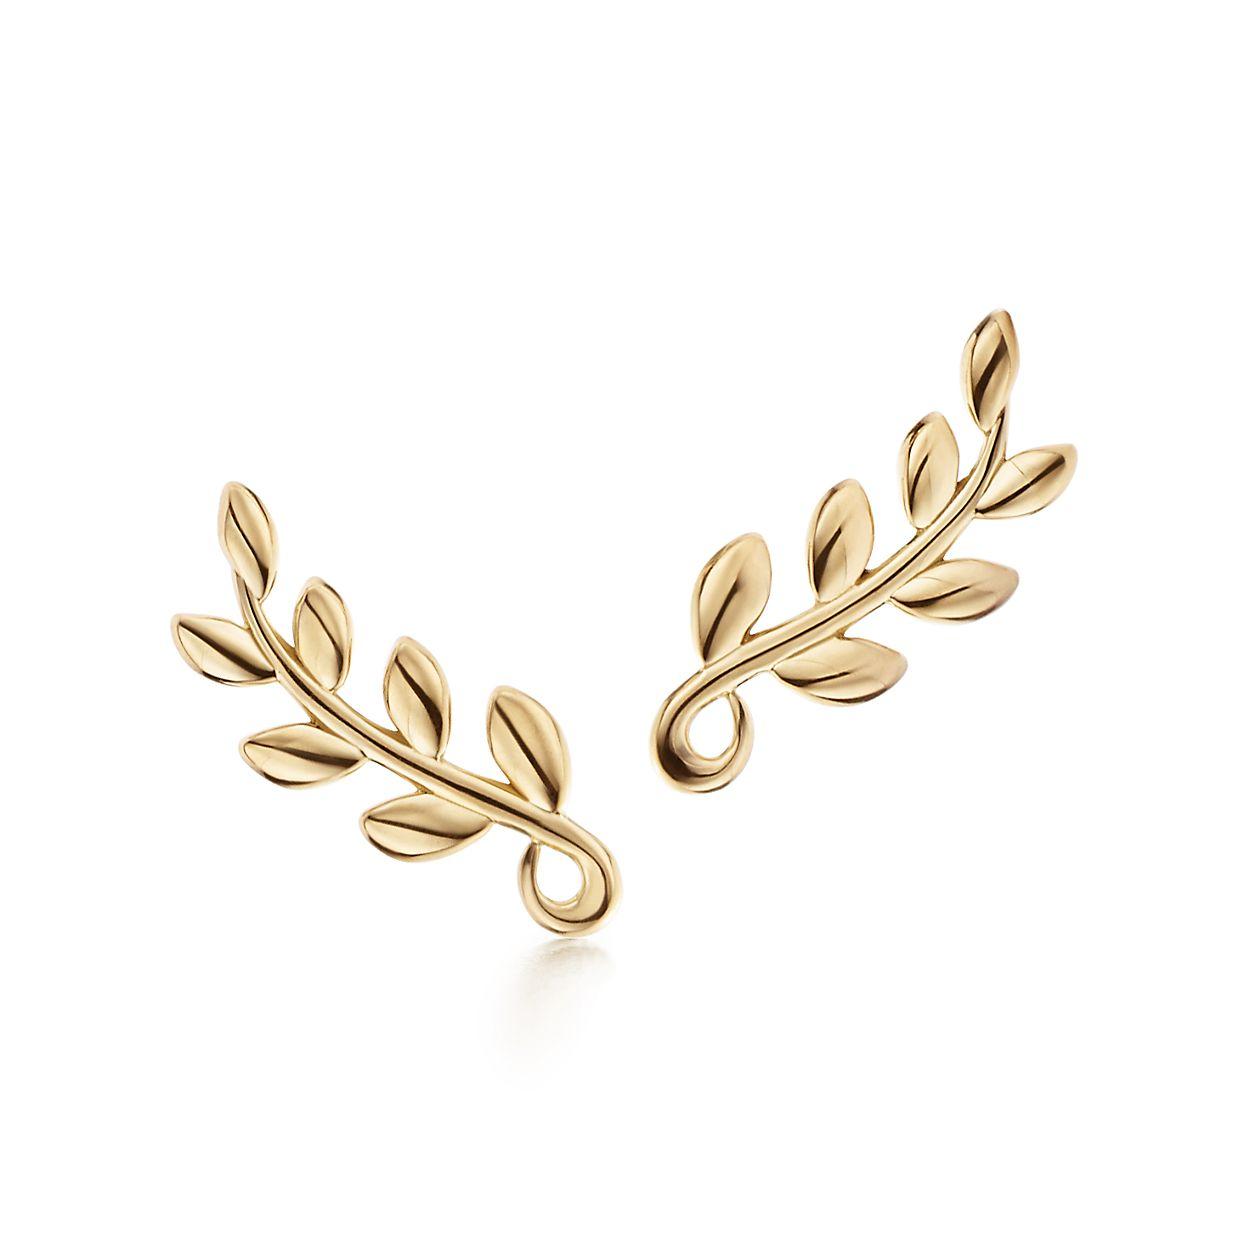 Paloma Pico Olive Leaf Climber Br Earrings